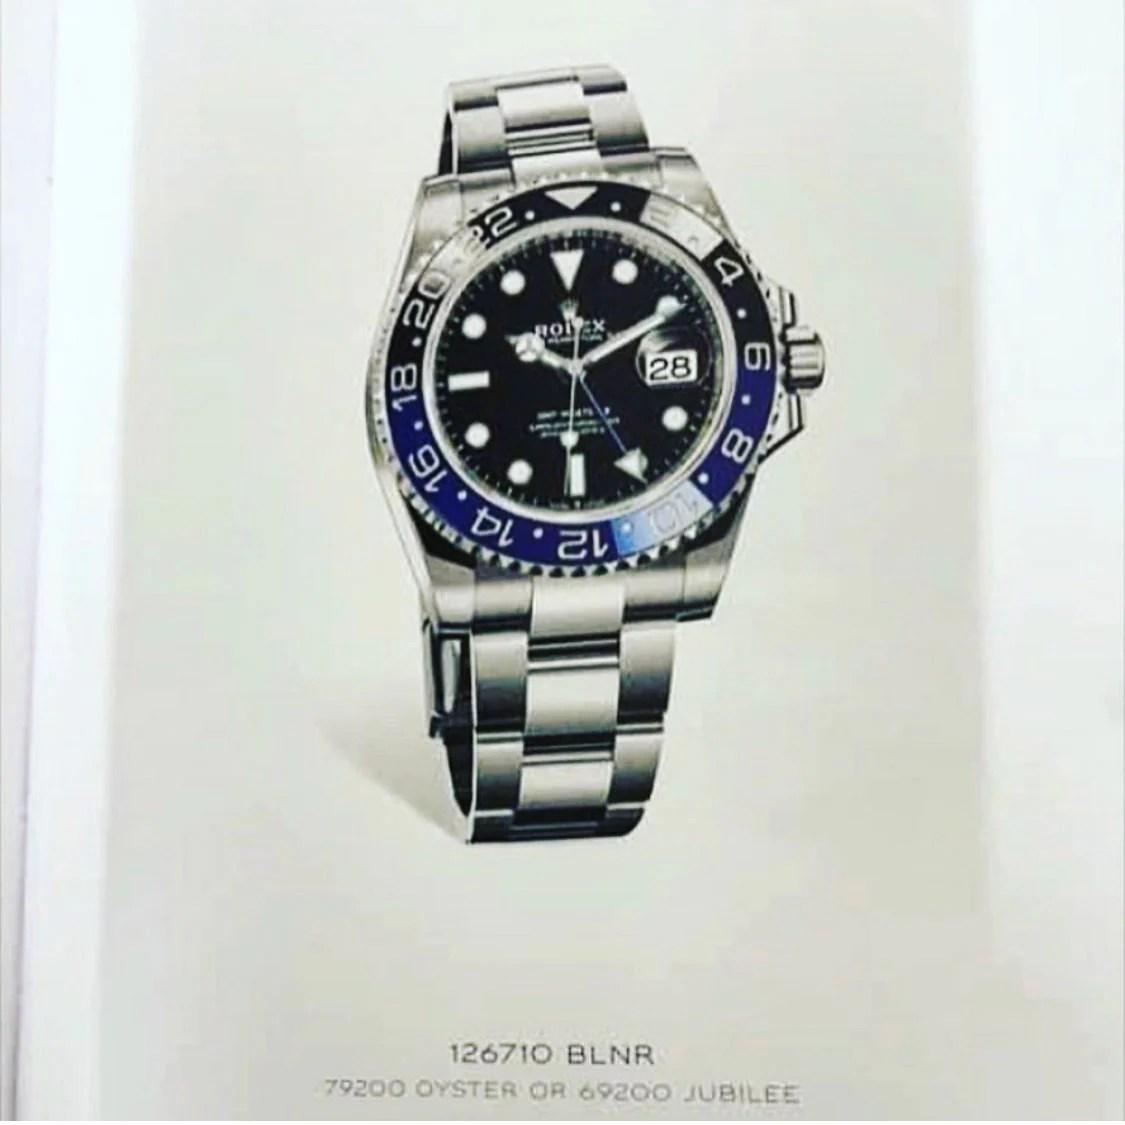 2021 Rolex GMT on Oyster bracelet